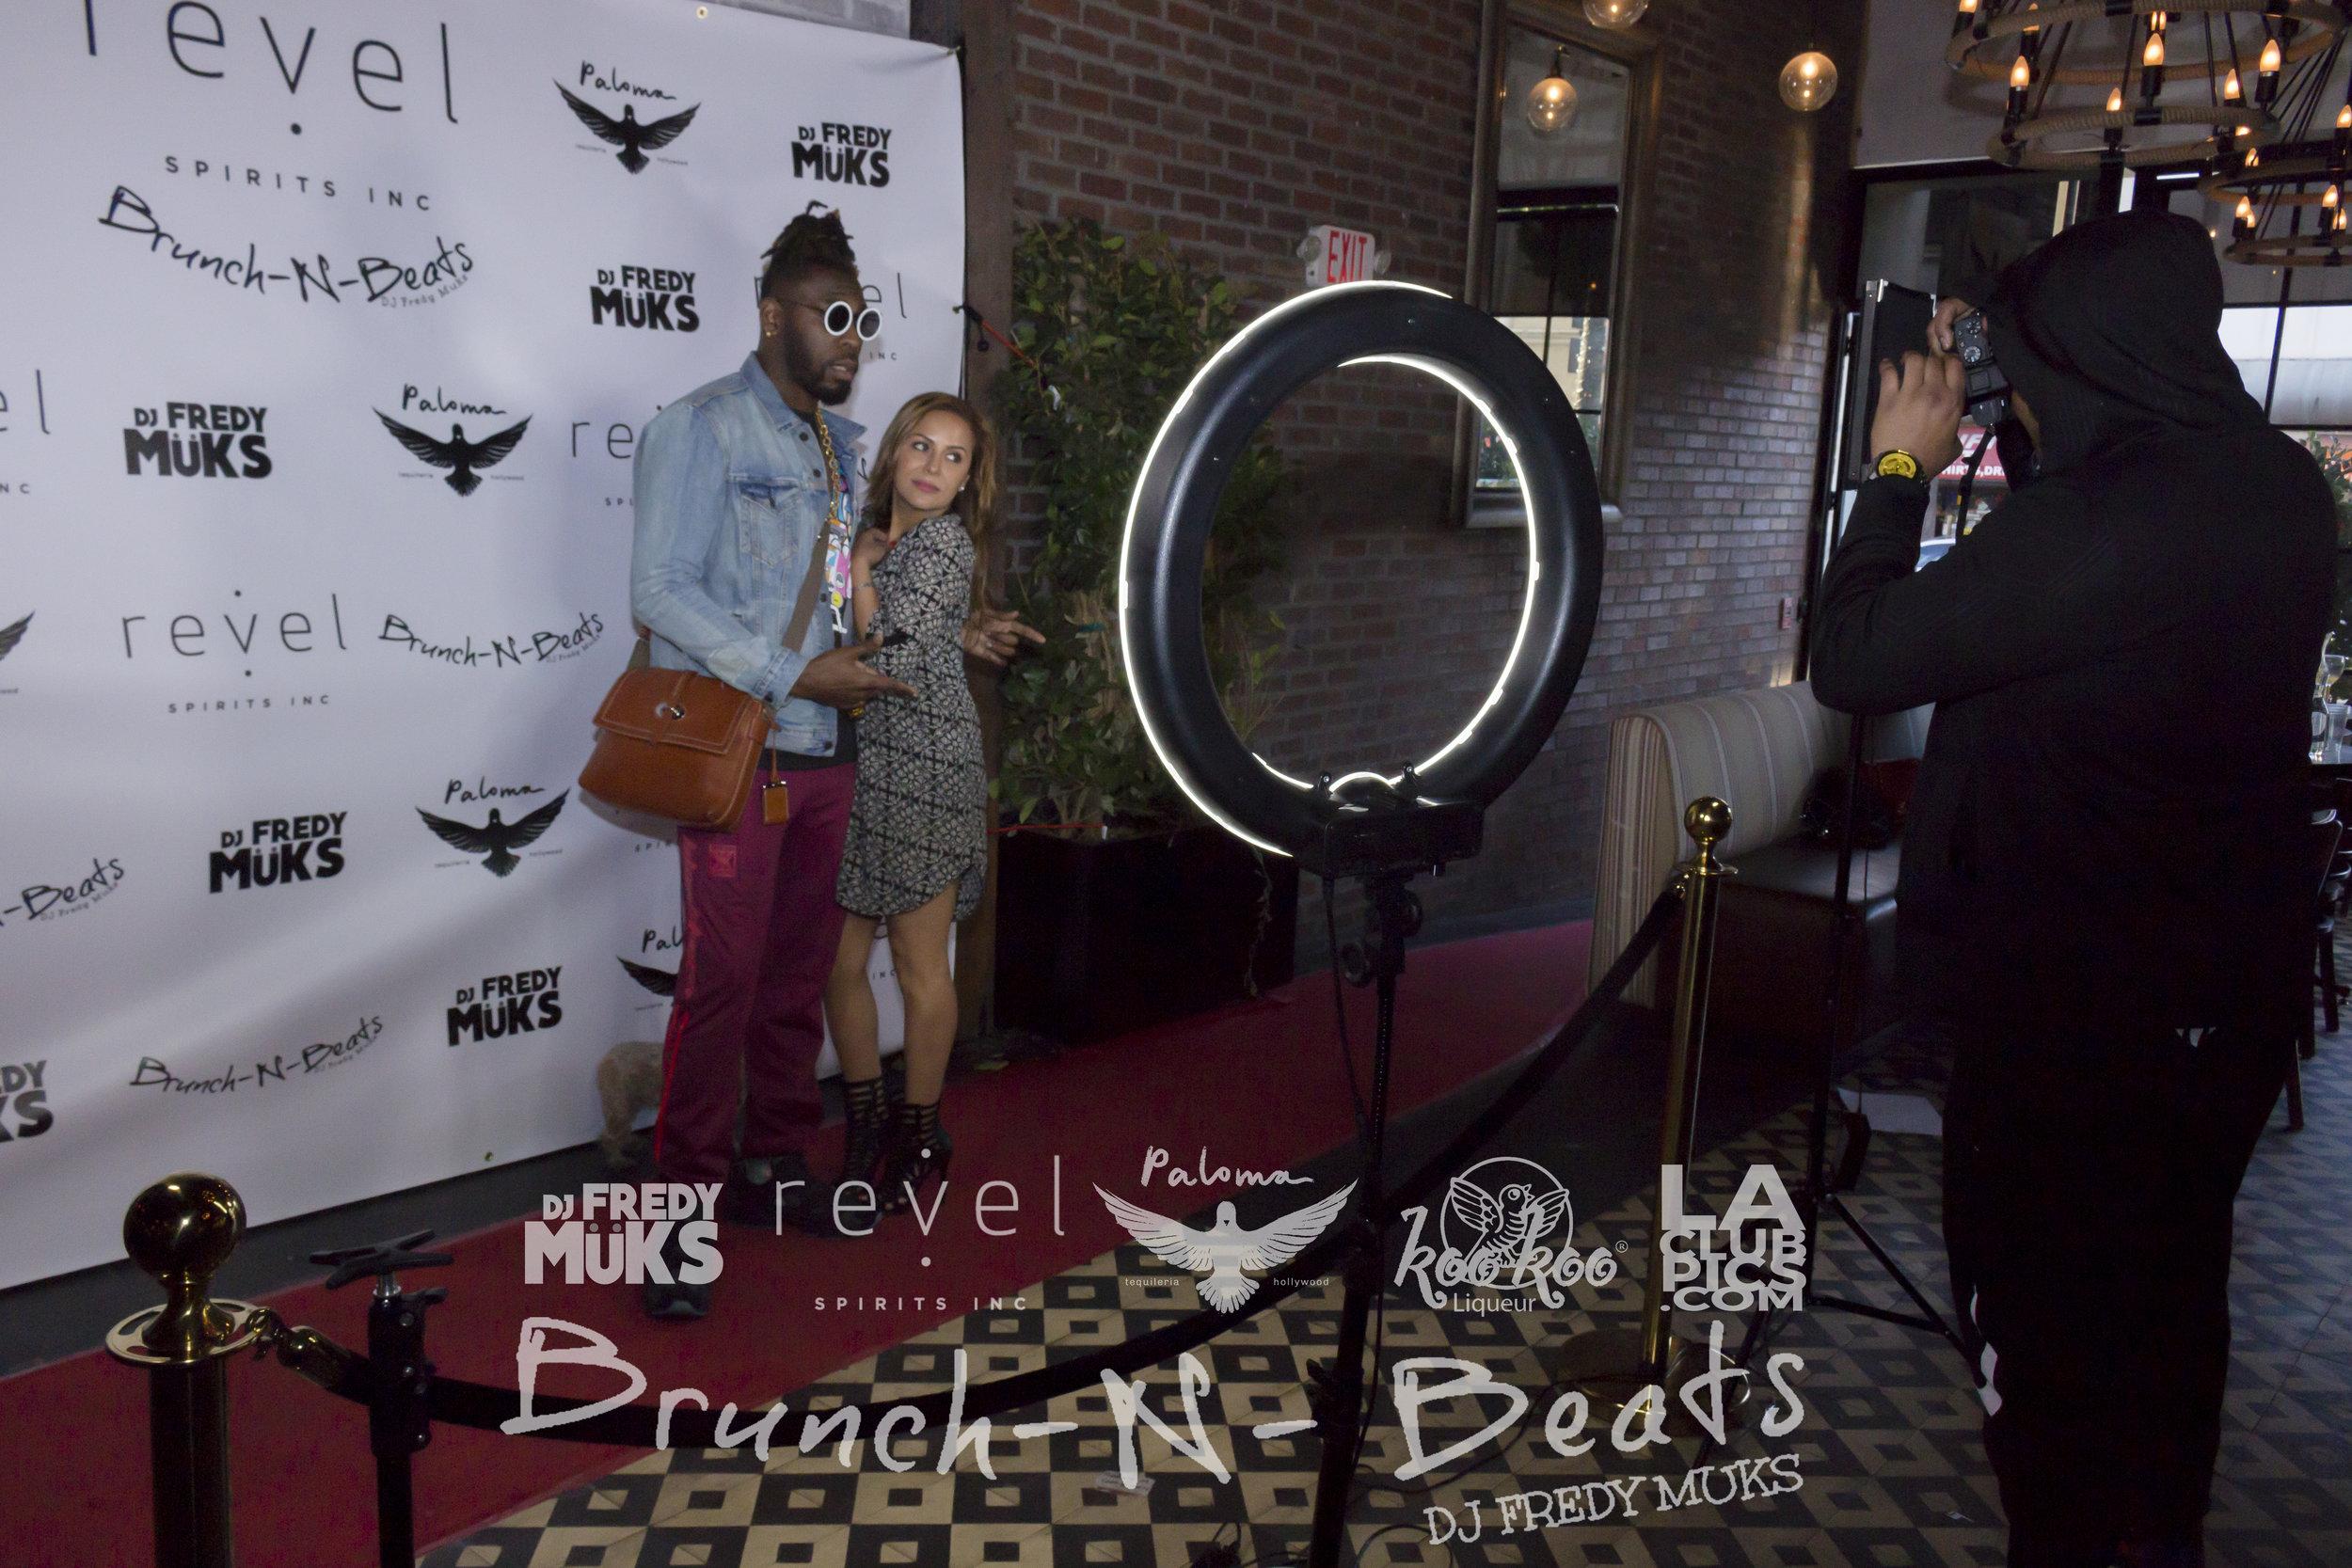 Brunch-N-Beats - Paloma Hollywood - 02-25-18_160.jpg